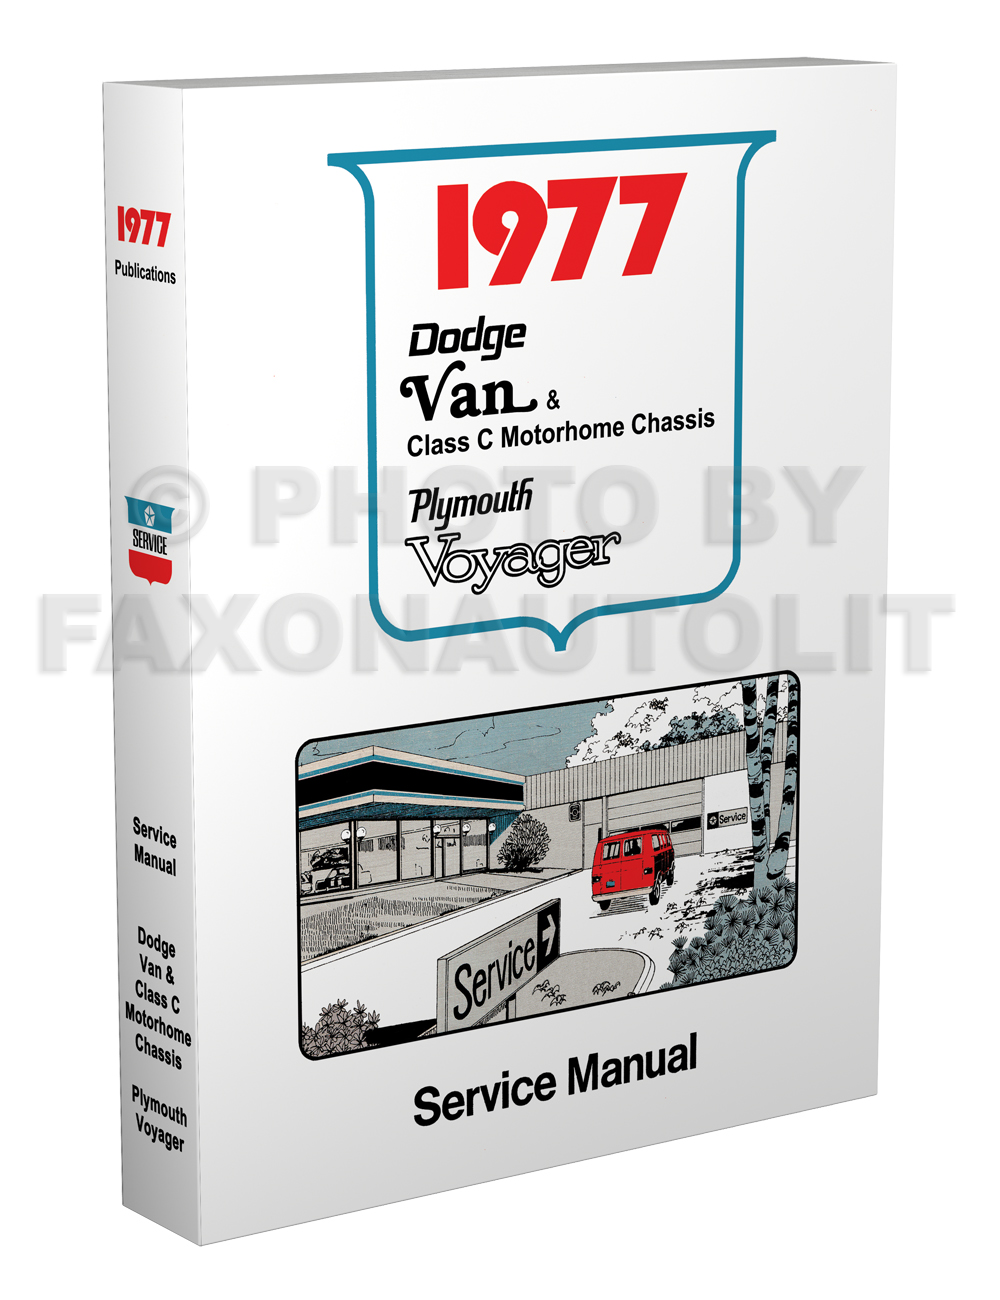 1977 Dodge Sportsman Motorhome Manual